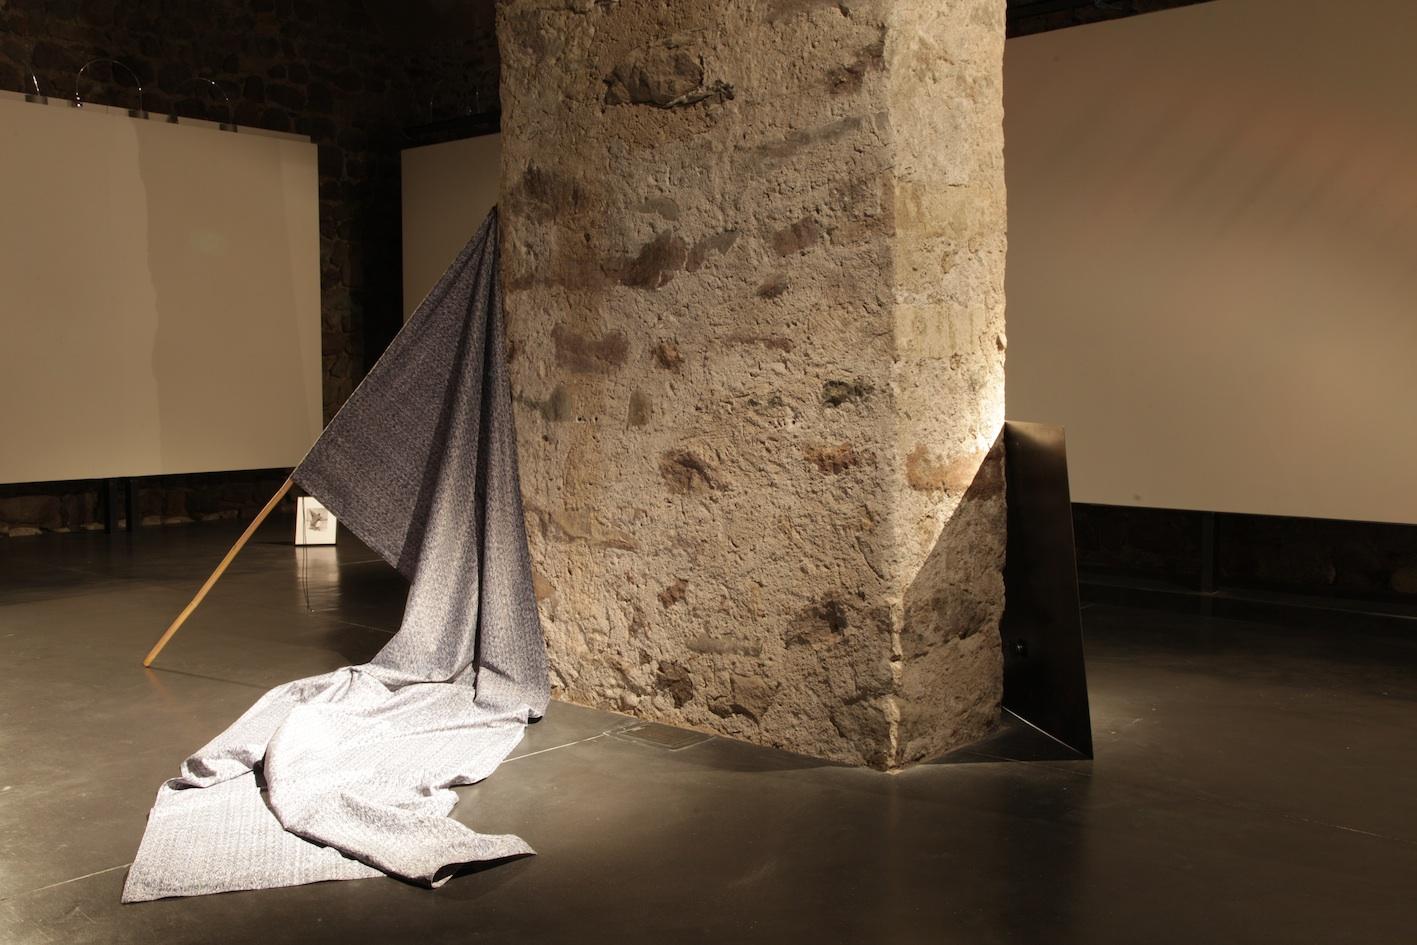 Benjamin Tomasi, Alex, multi part sound and object installation, dimensioni variabili, 2014